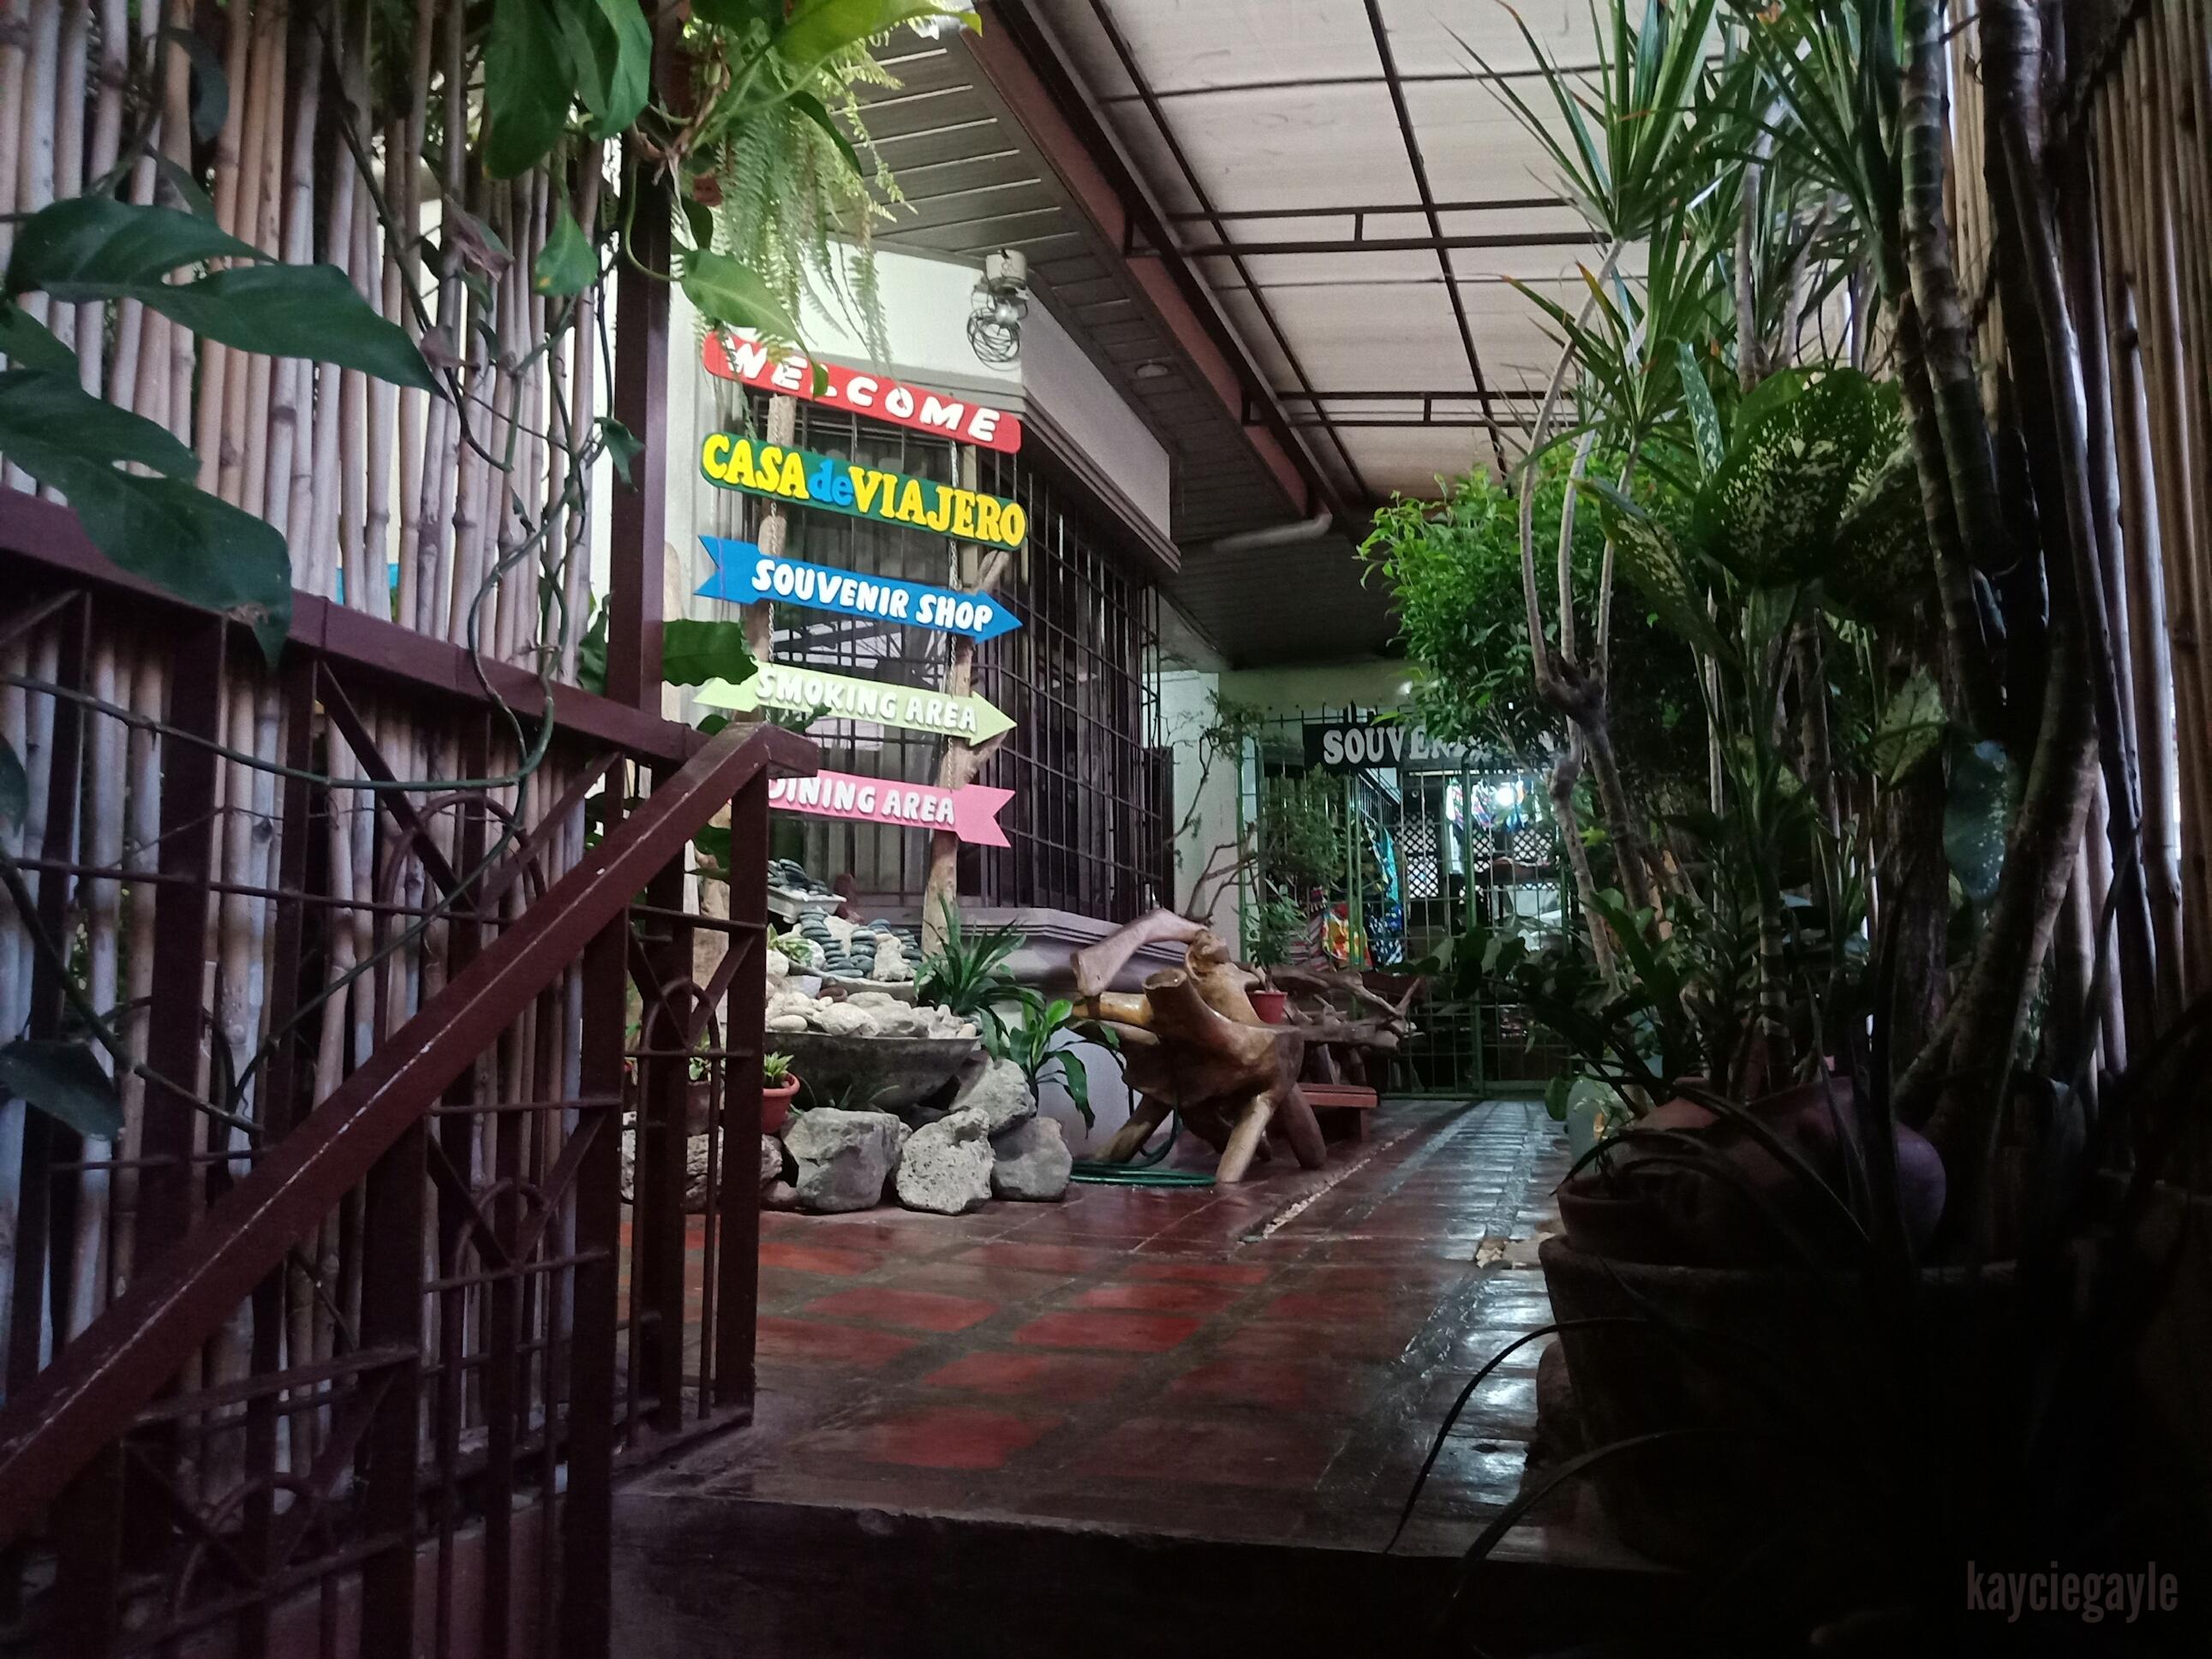 Casa de Viajero Tourist Inn Stairs